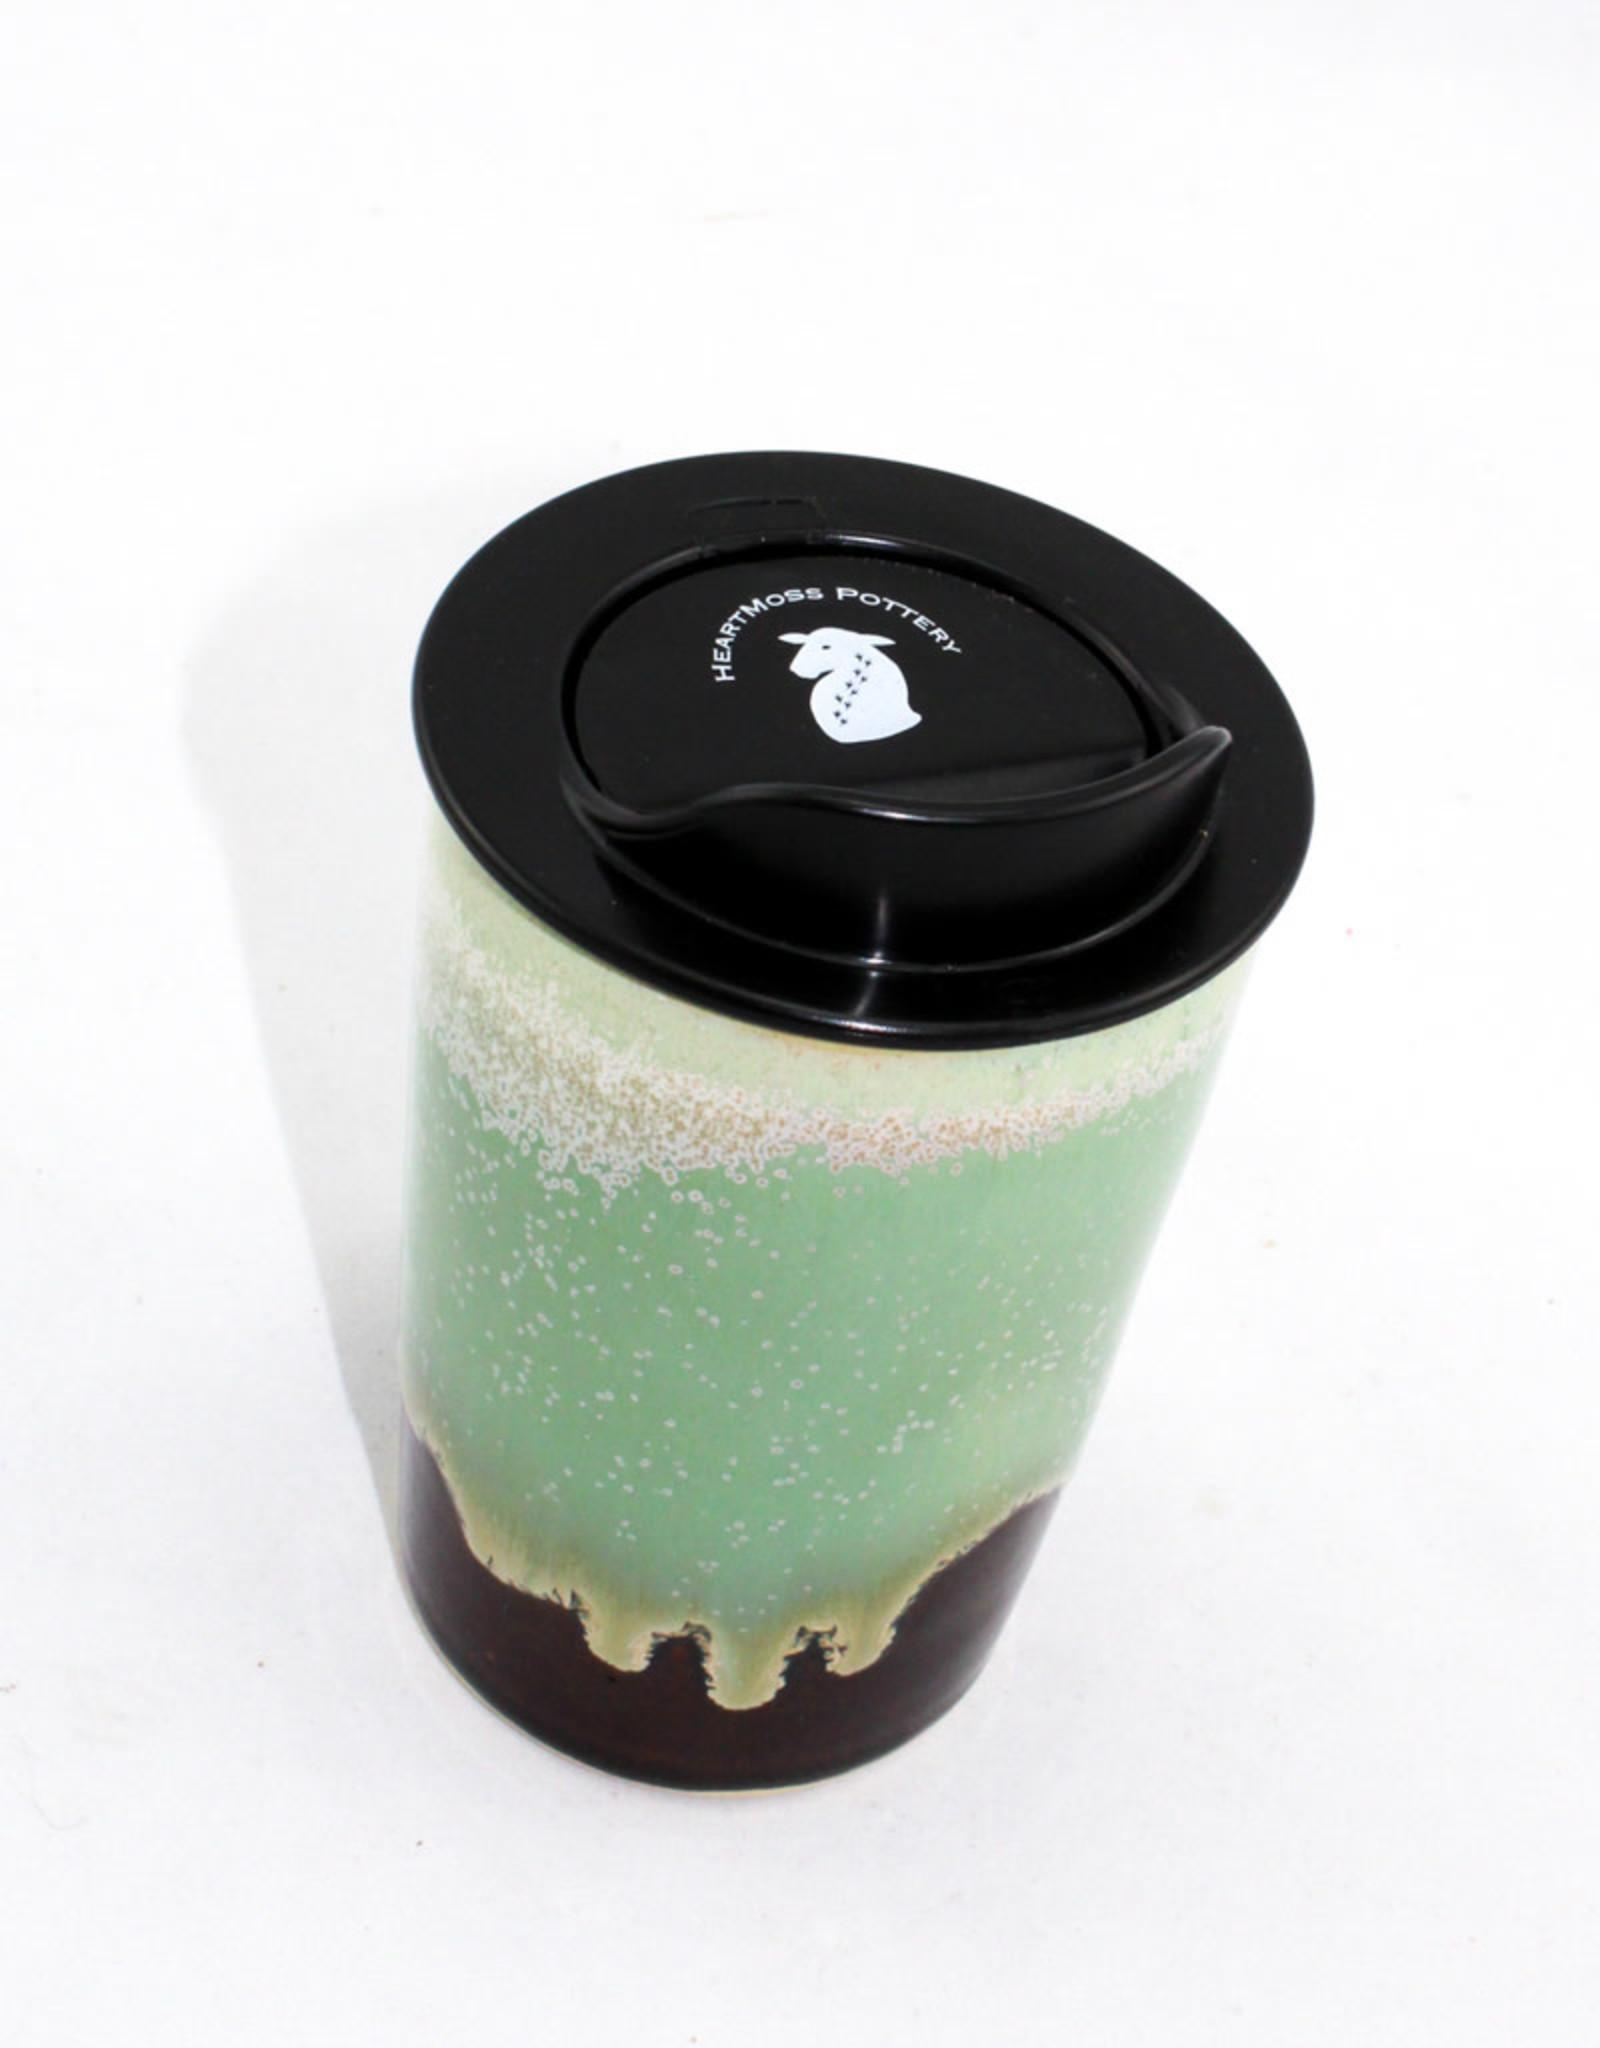 HeartMoss Pottery 12oz. Sea Foam Travel Mug